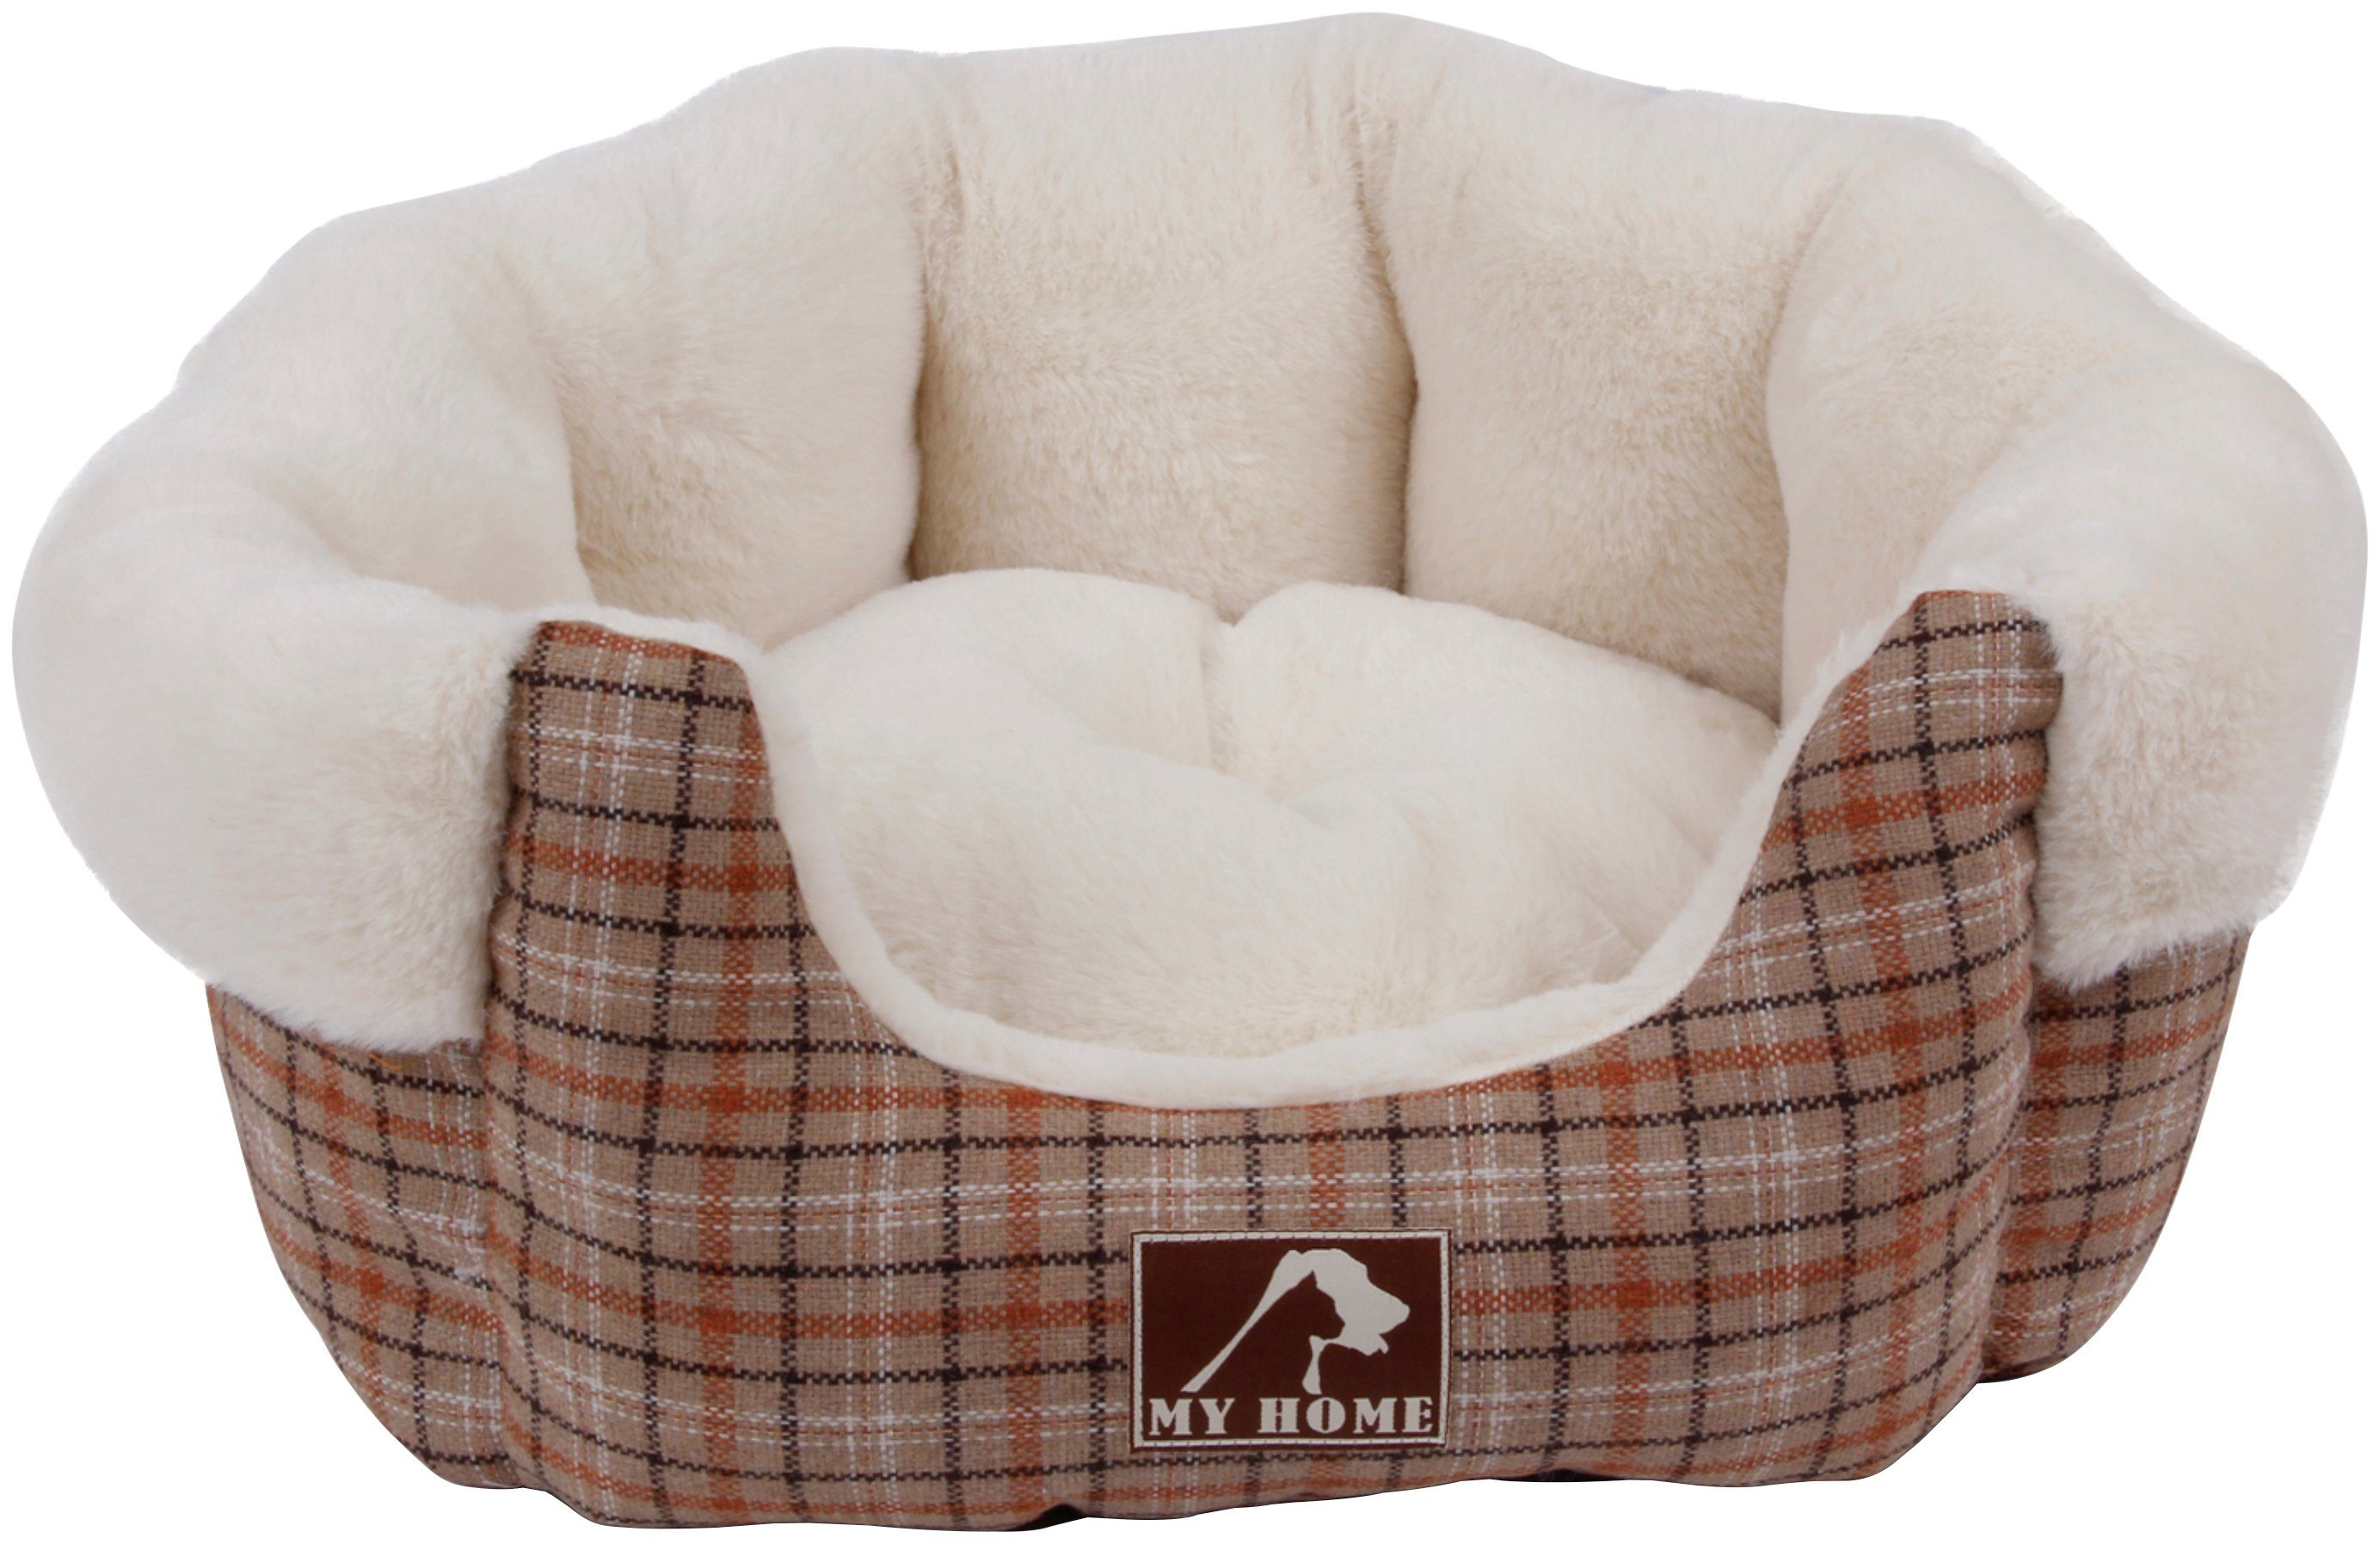 HEIM Hundebett und Katzenbett »Classic«, beige, BxT: 46x45 cm